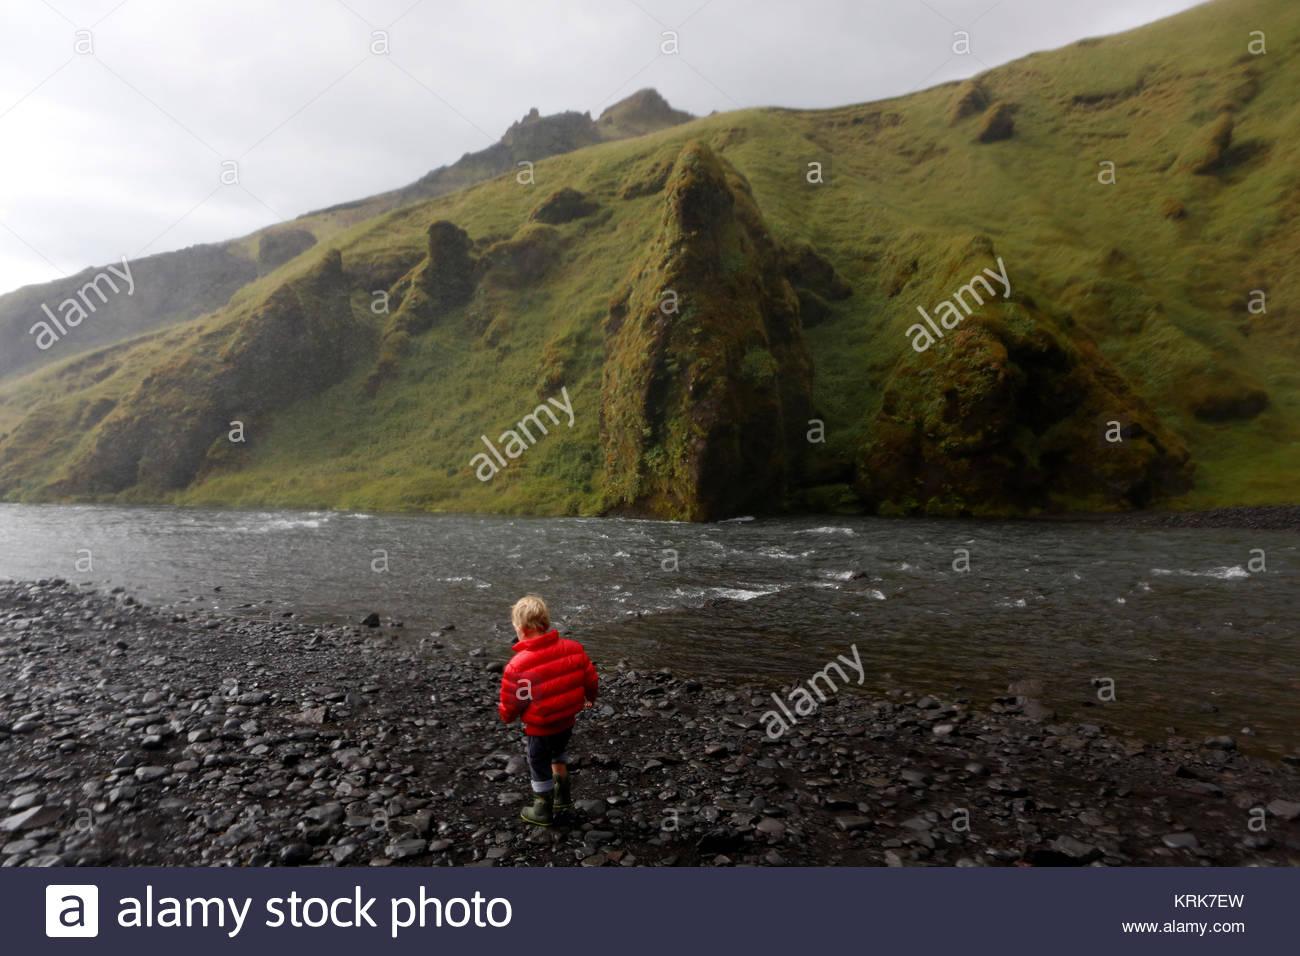 Caucasian boy was standing near rocky river - Stock Image